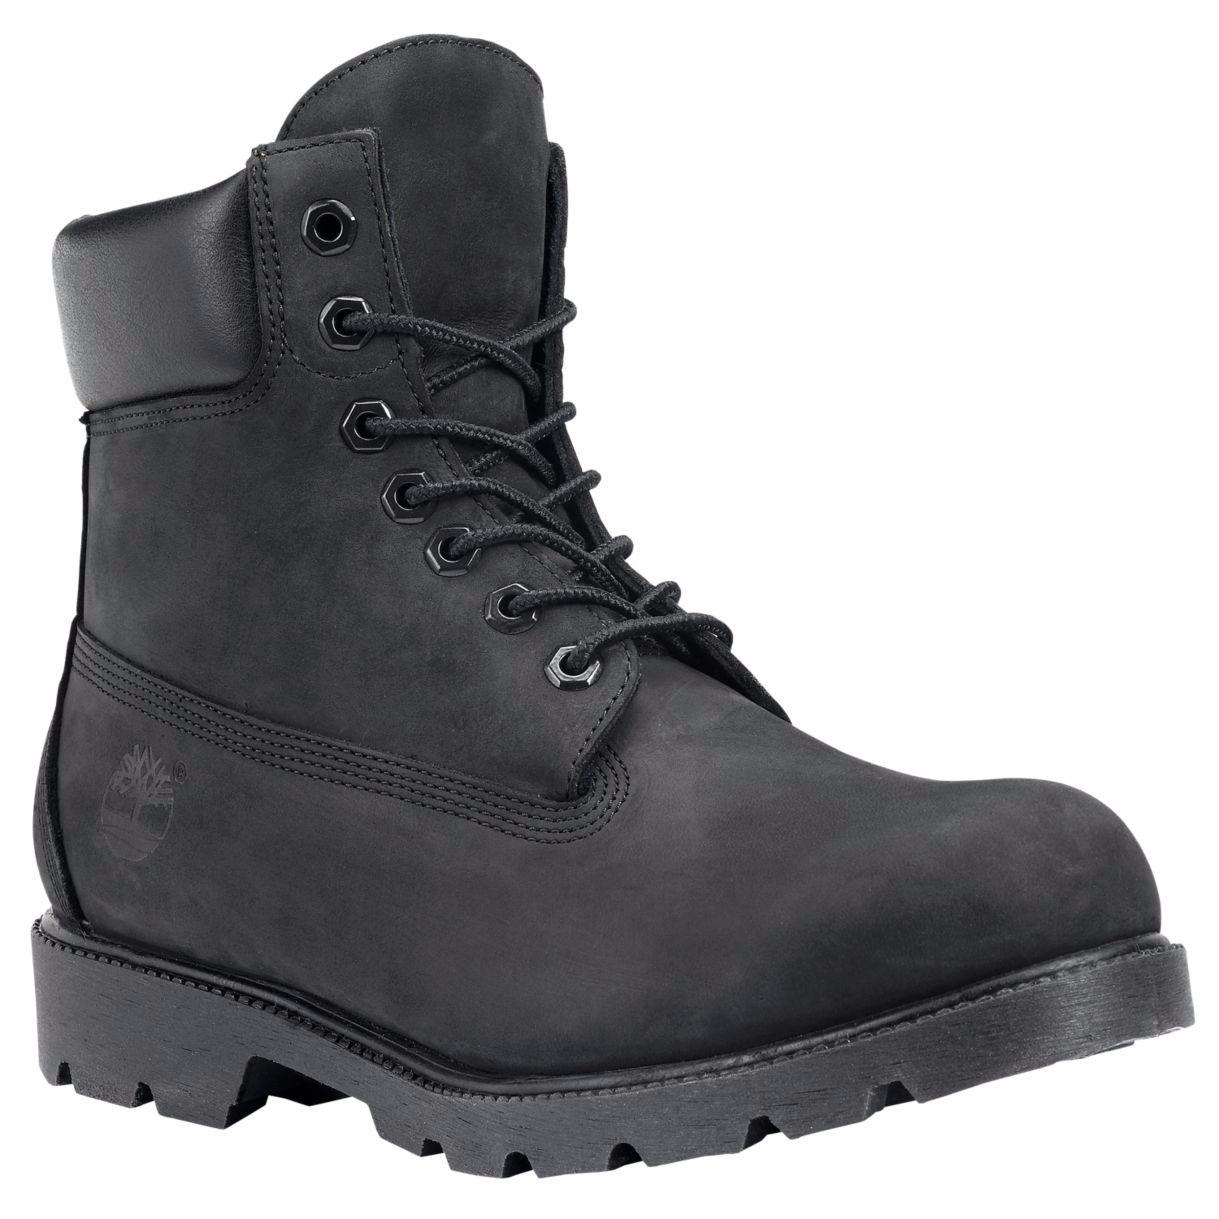 Men's Shoes Timberland 6 Inch Basic Waterproof Boots 19039 Black Nubuck *New*